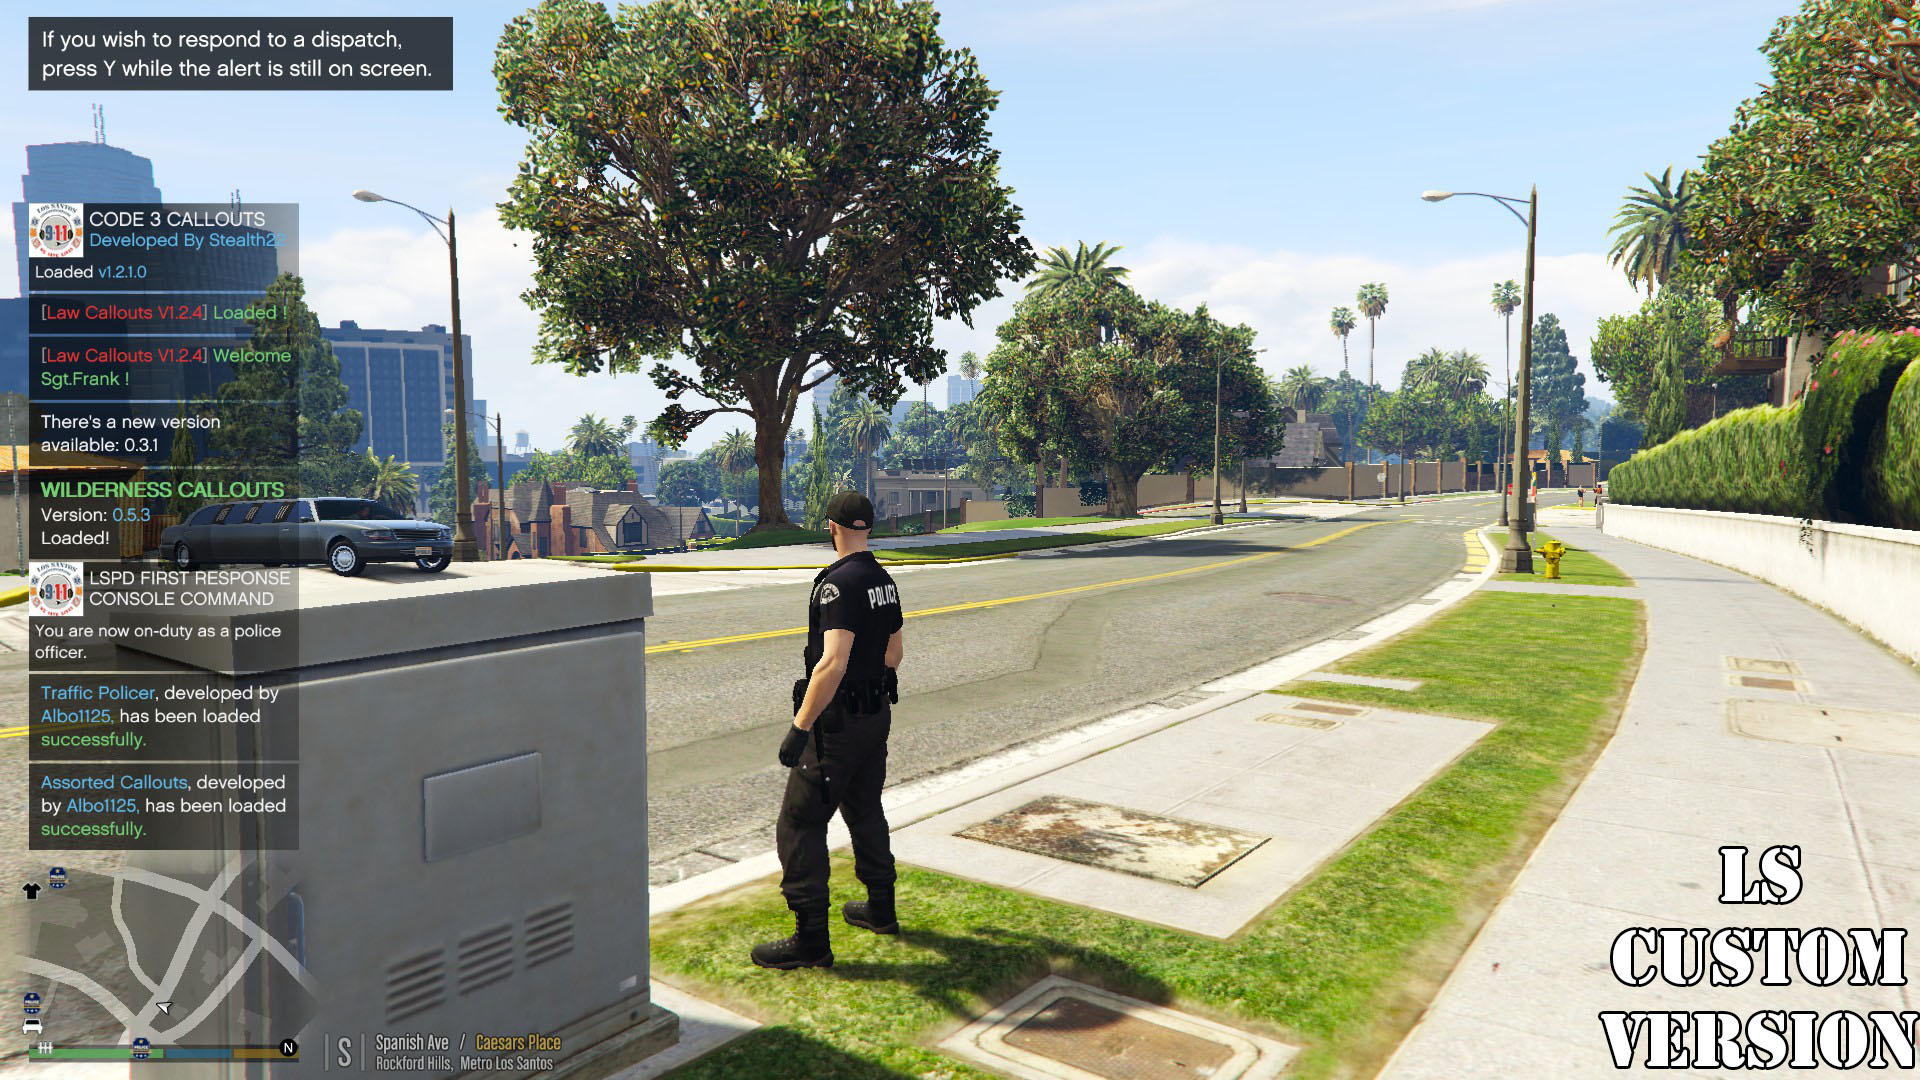 LA/LS Custom Emergency Services Blip & Callout Notification